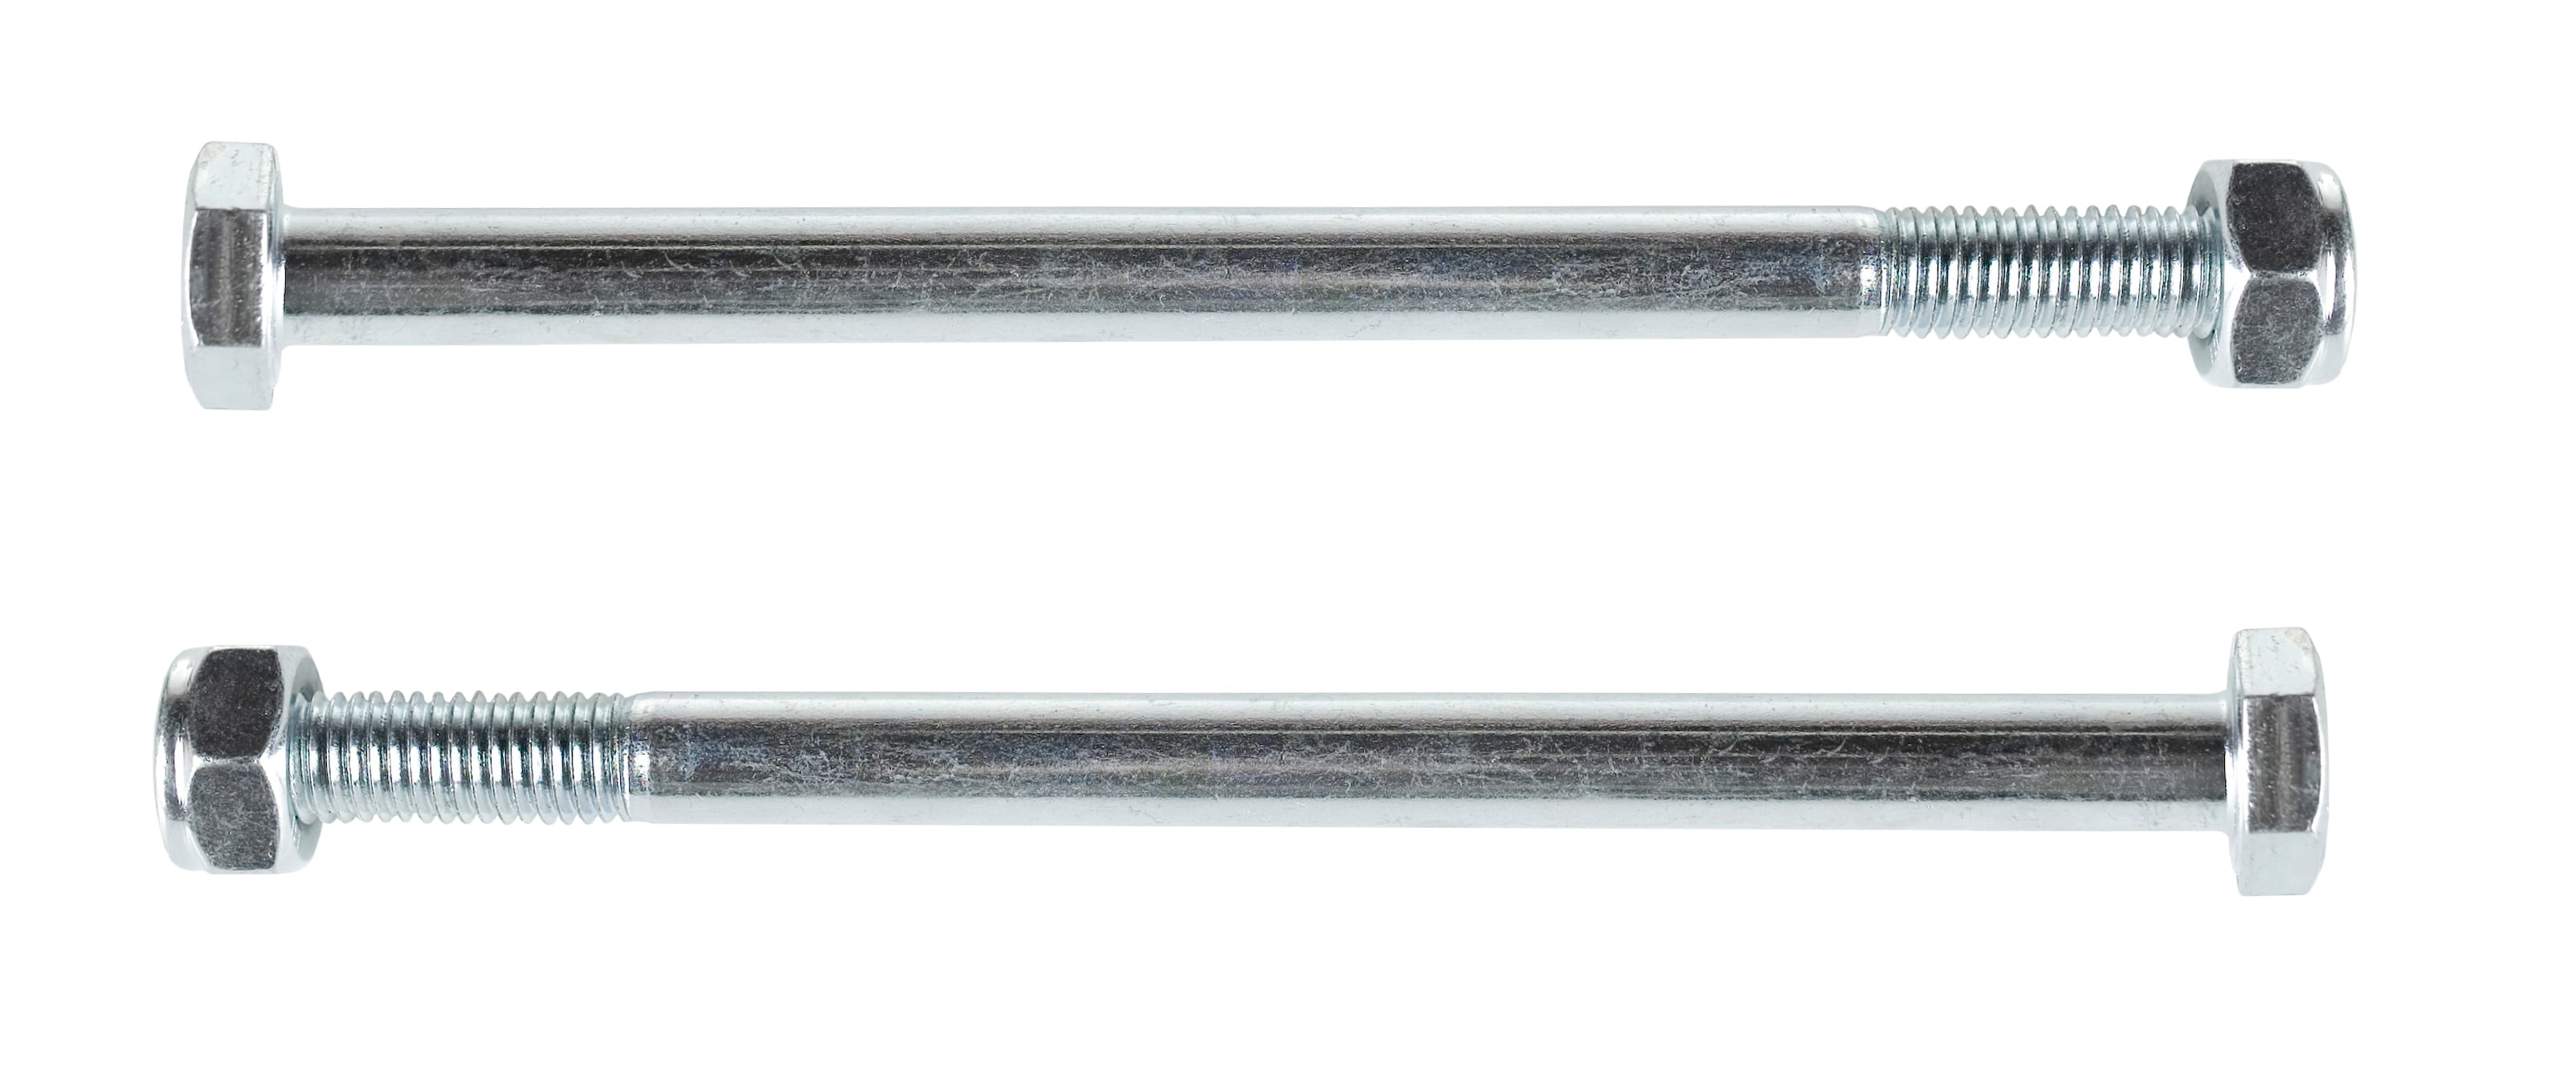 Finntack bolter for sulkyhjul, Contender/UFO/Spyder